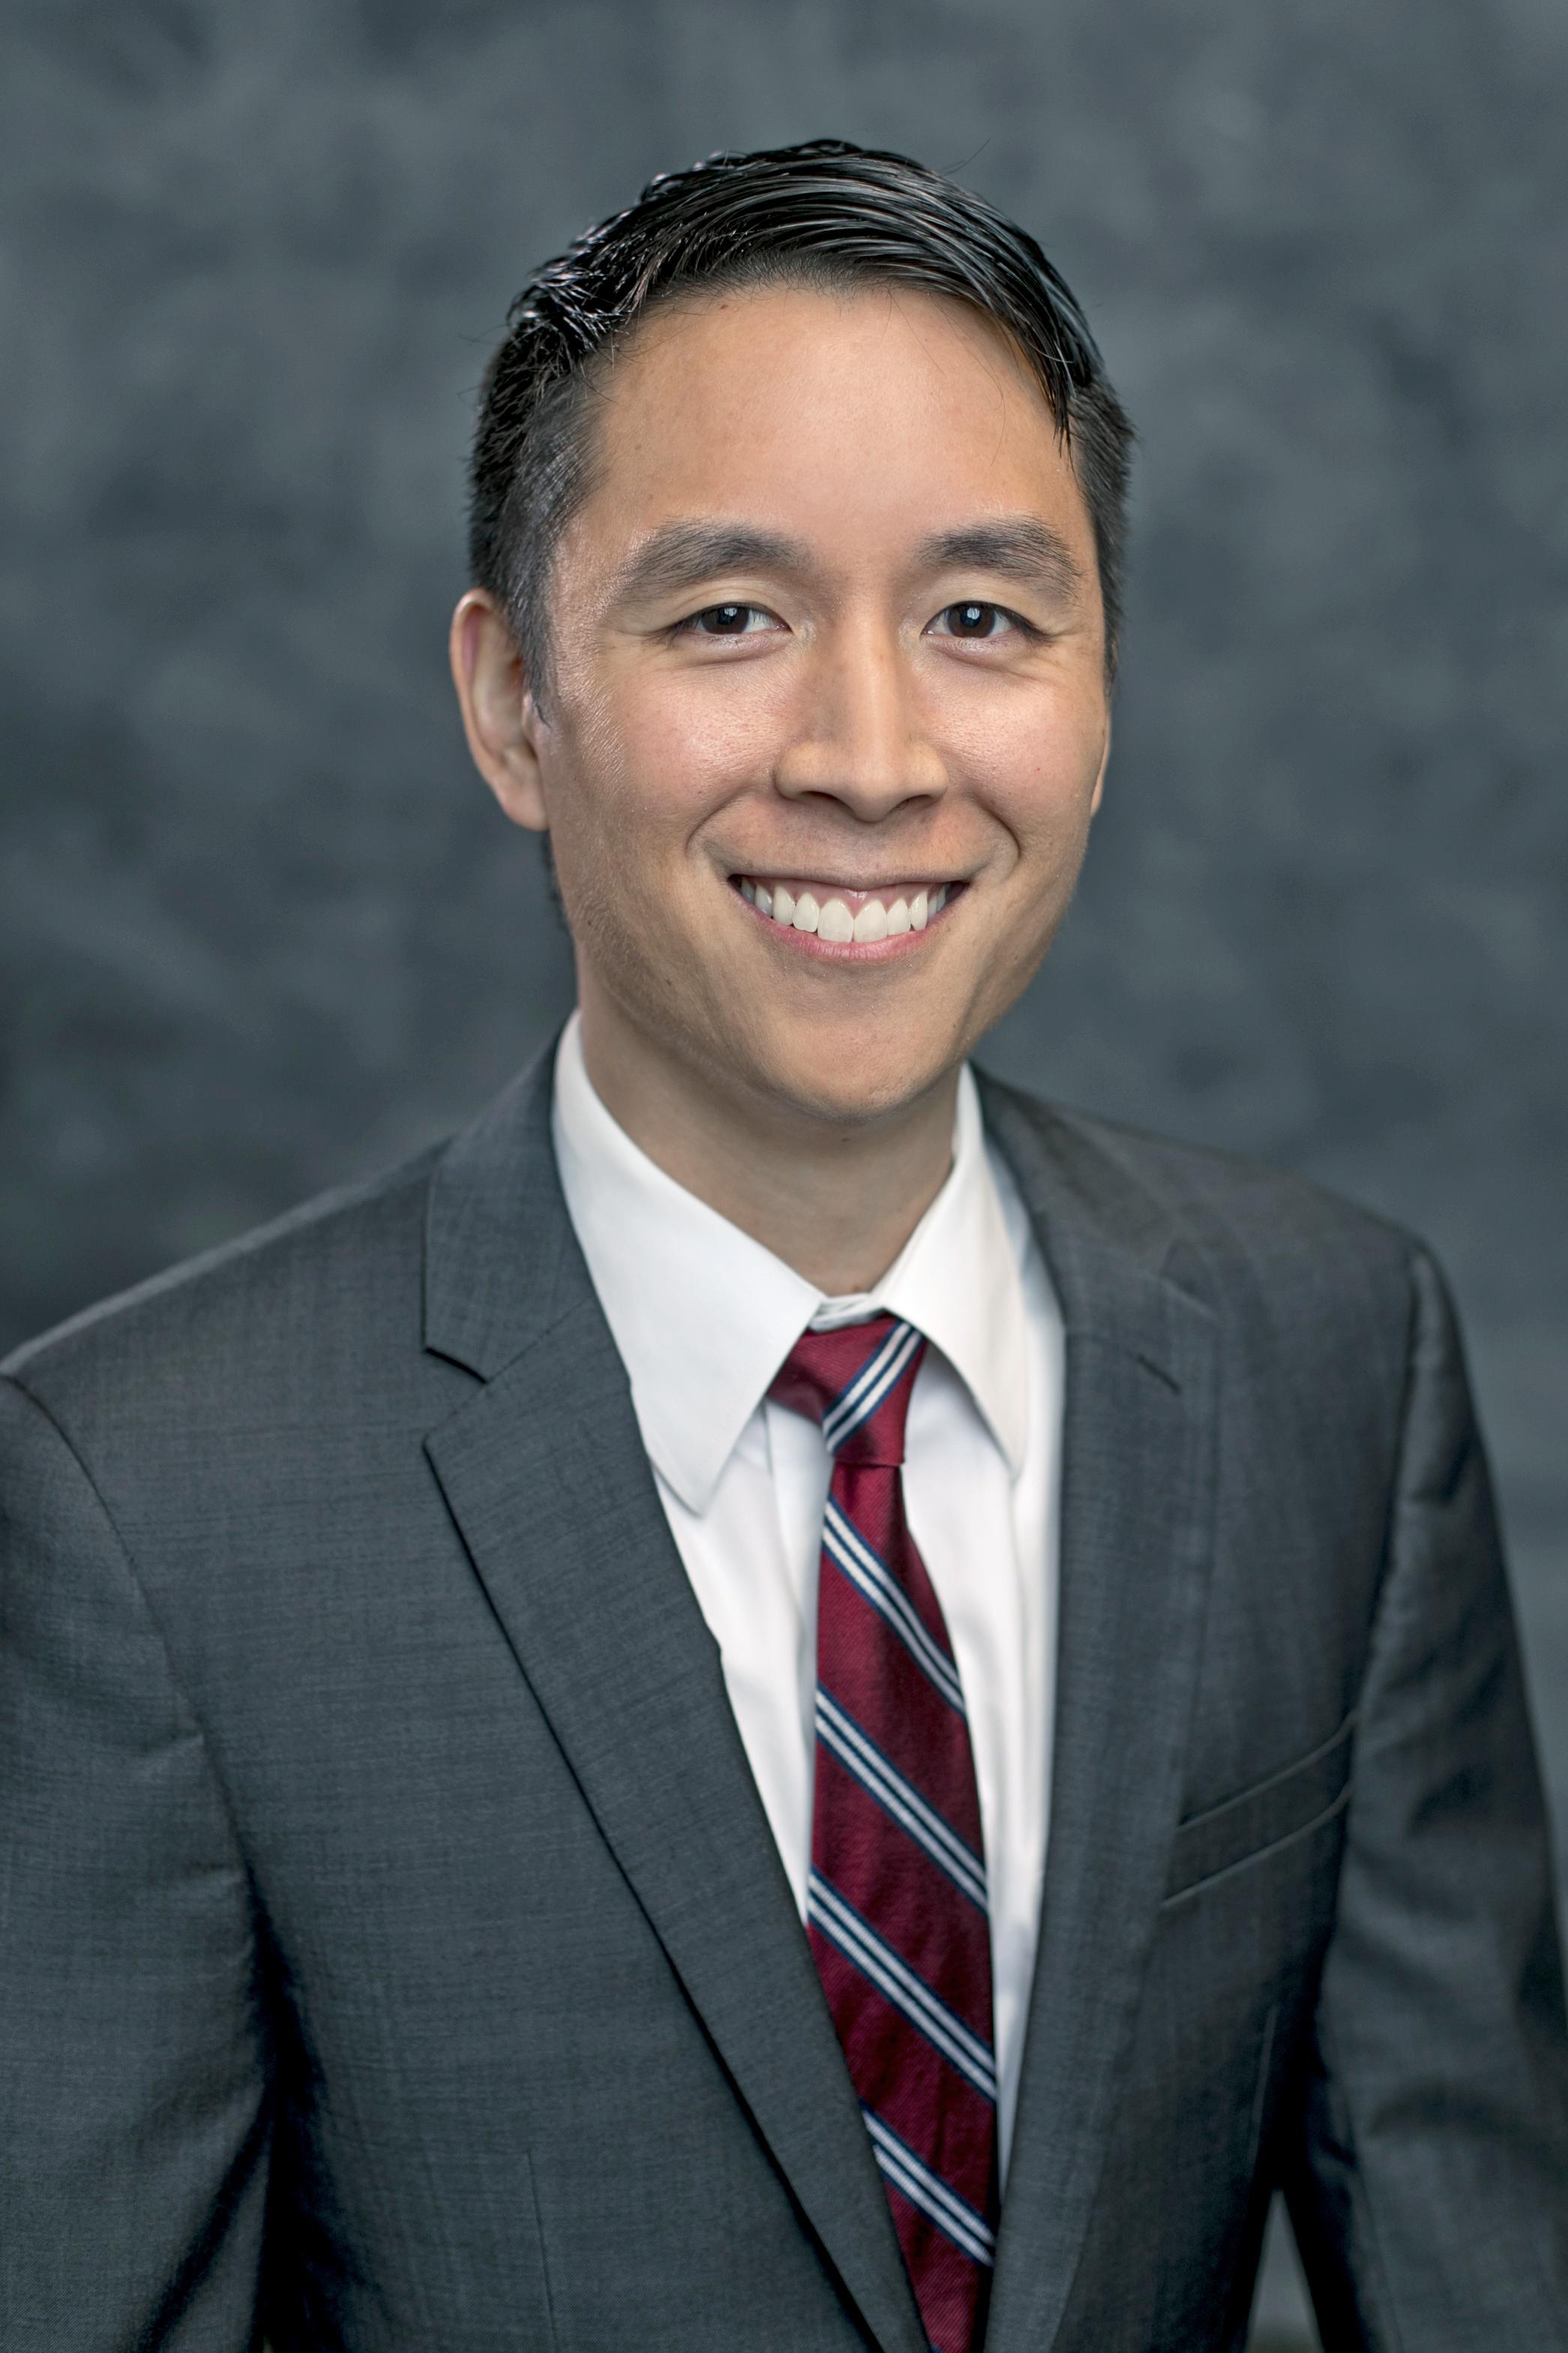 Brian D. Schwab, MD